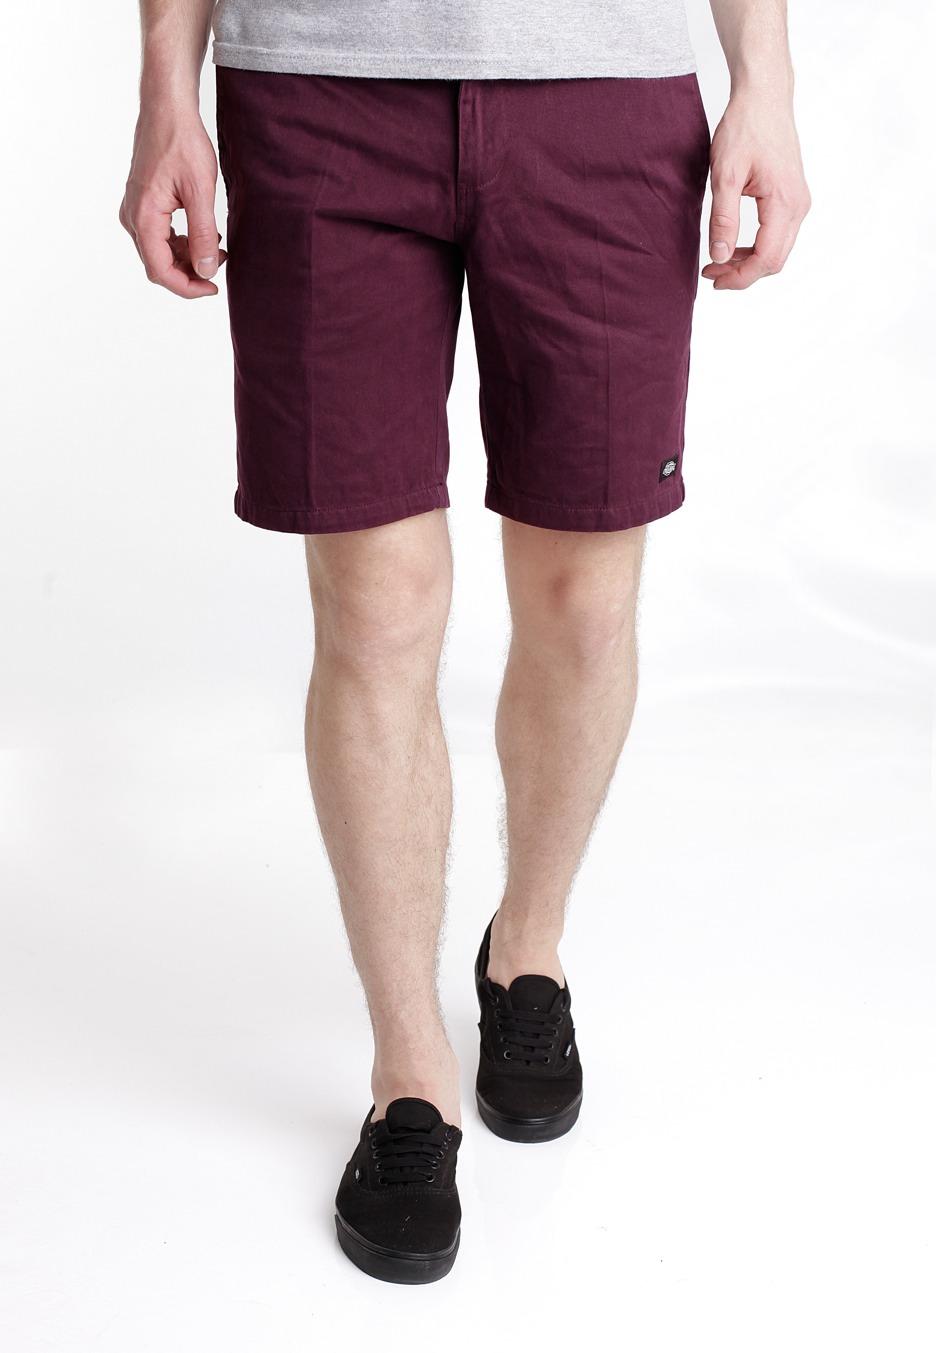 aa23c87d1076 Dickies - C 182 Gd Maroon - Shorts - Impericon.com UK